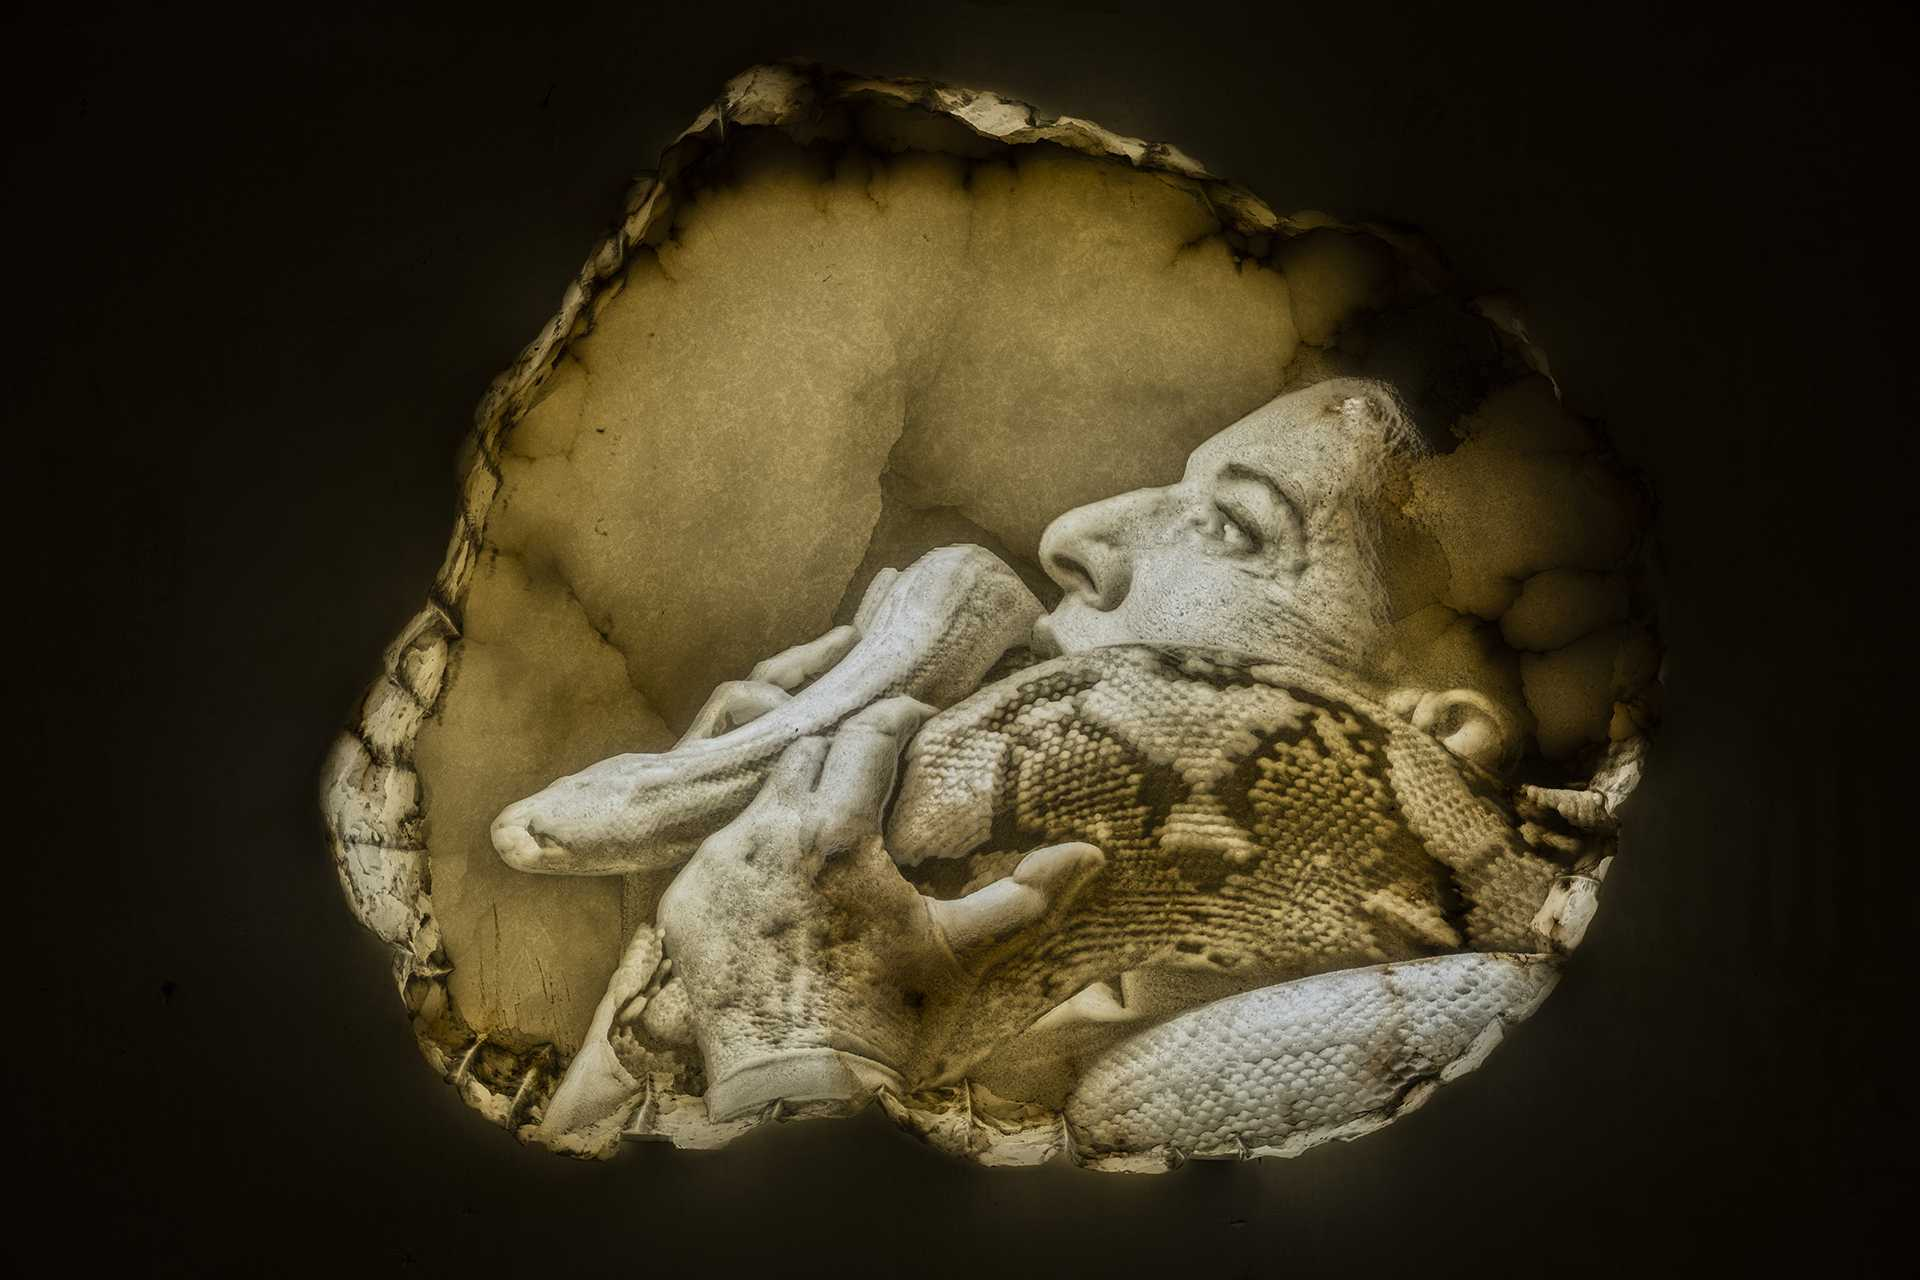 Marina Abramović, Seven Deaths Series, The Snake, 2020/2021 (Lisson Gallery)